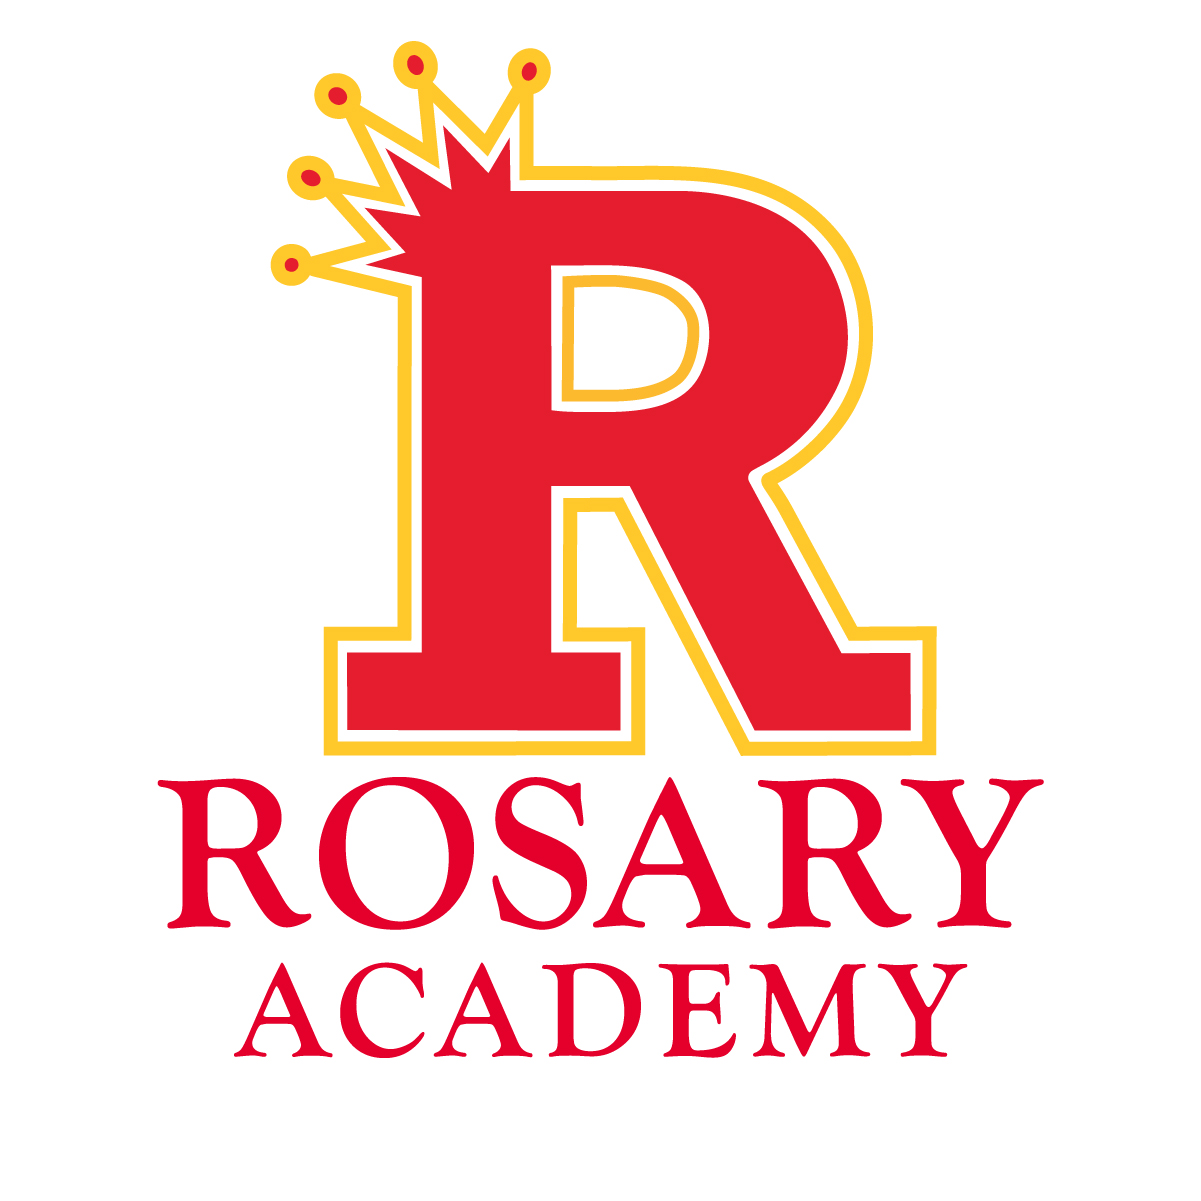 Rosary Academy